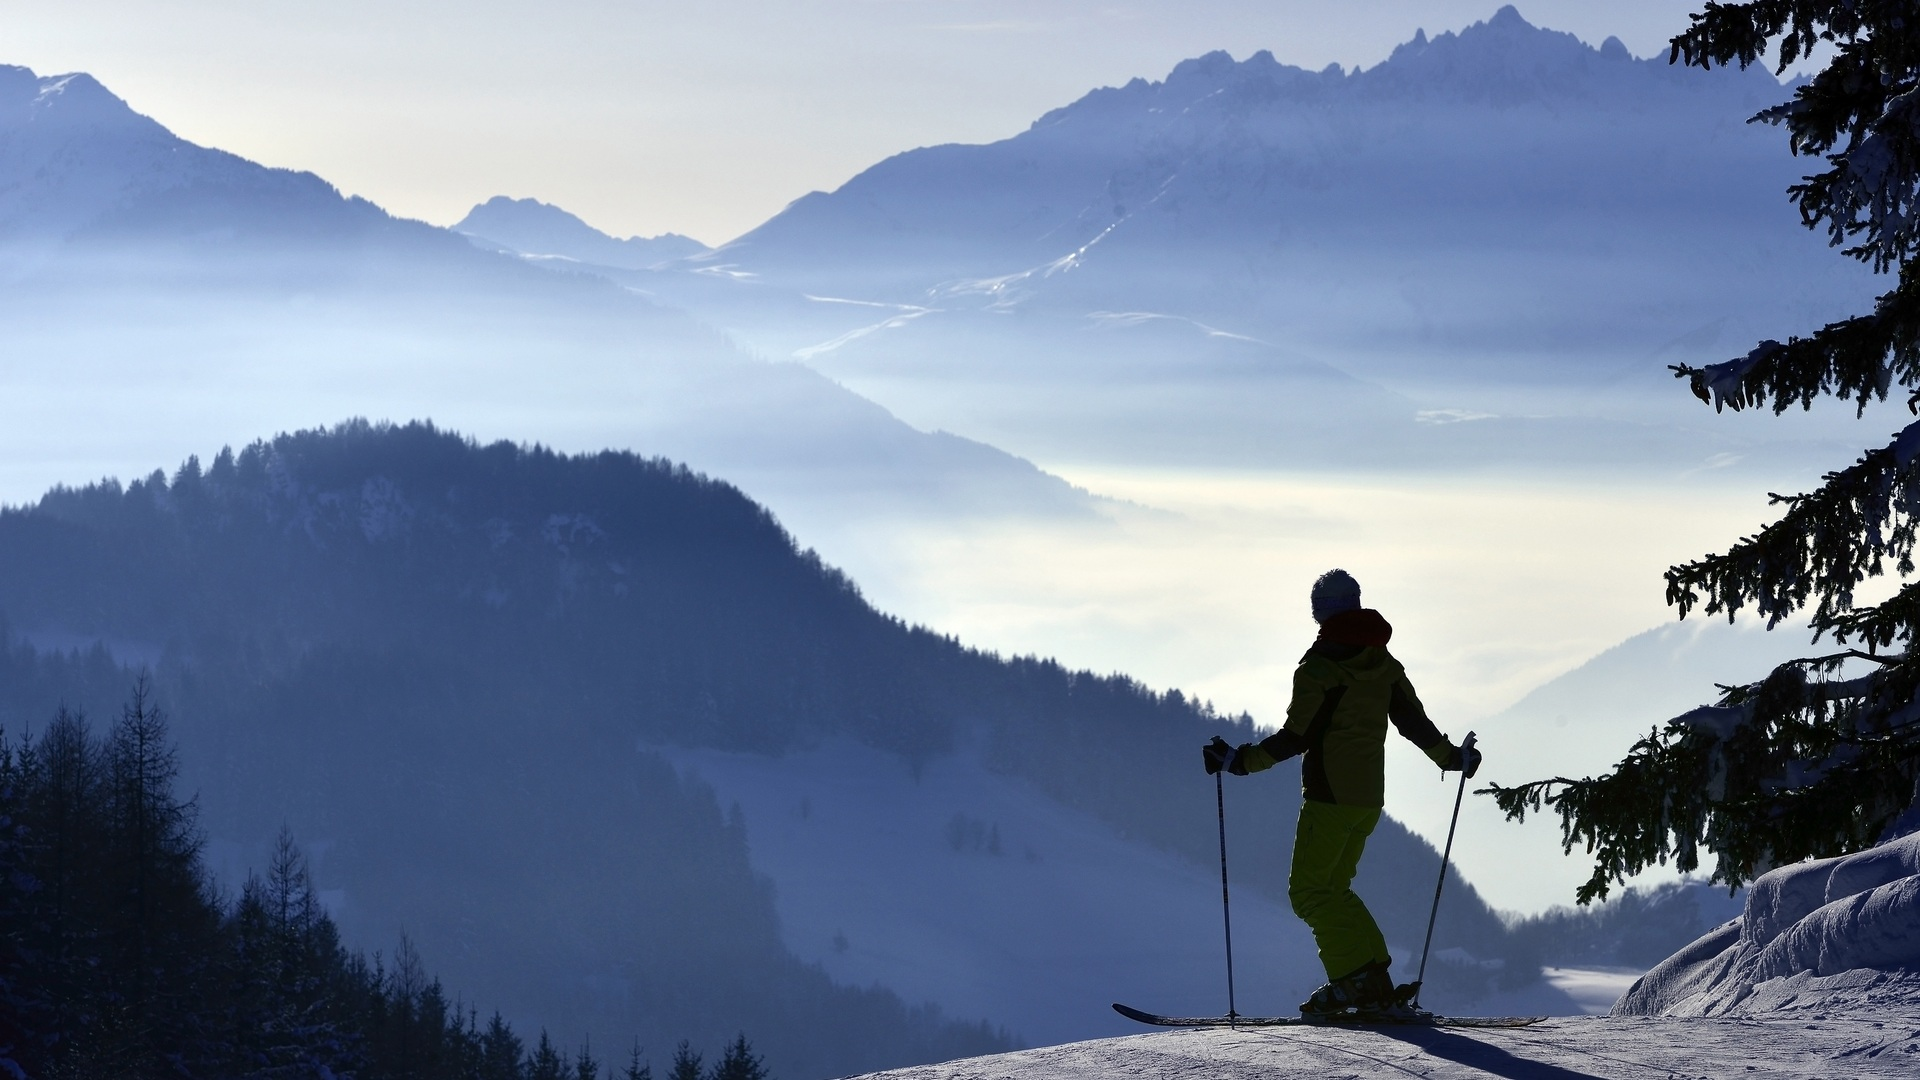 Le domaine skiable de Montalbert